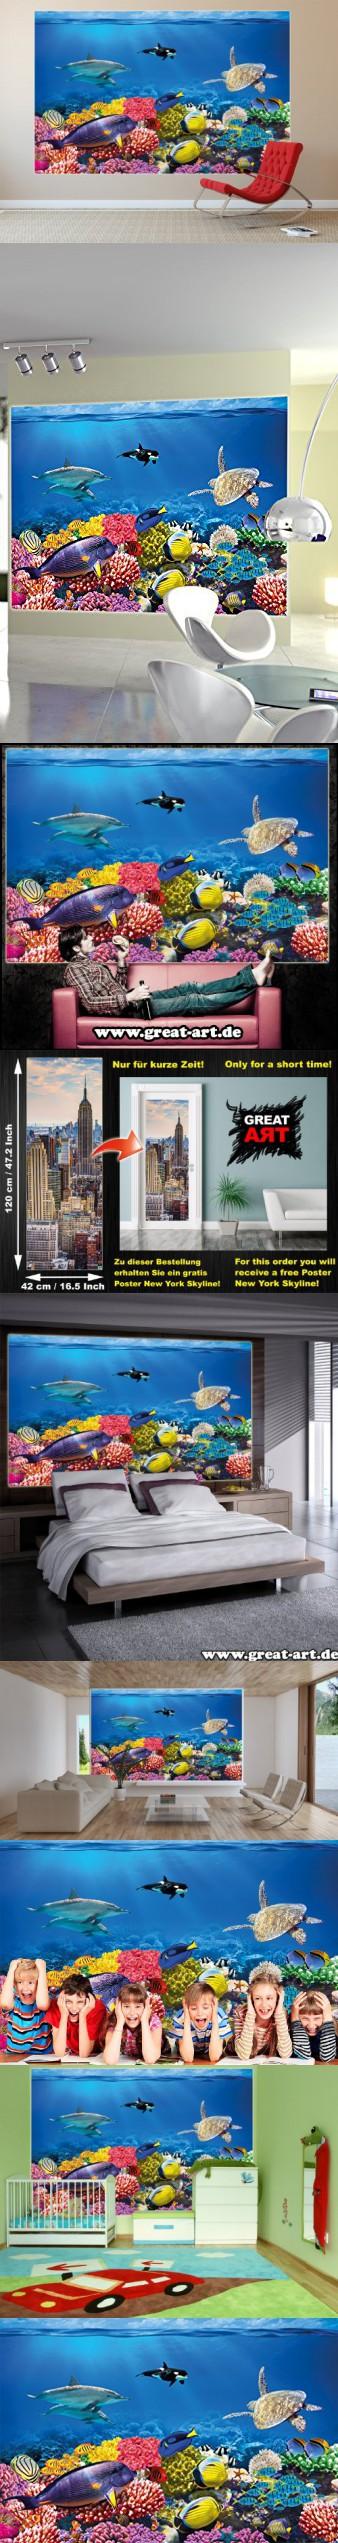 Undersea coral reef photo wall paper aquarium fish sea for Decor mural xxl 4 murs